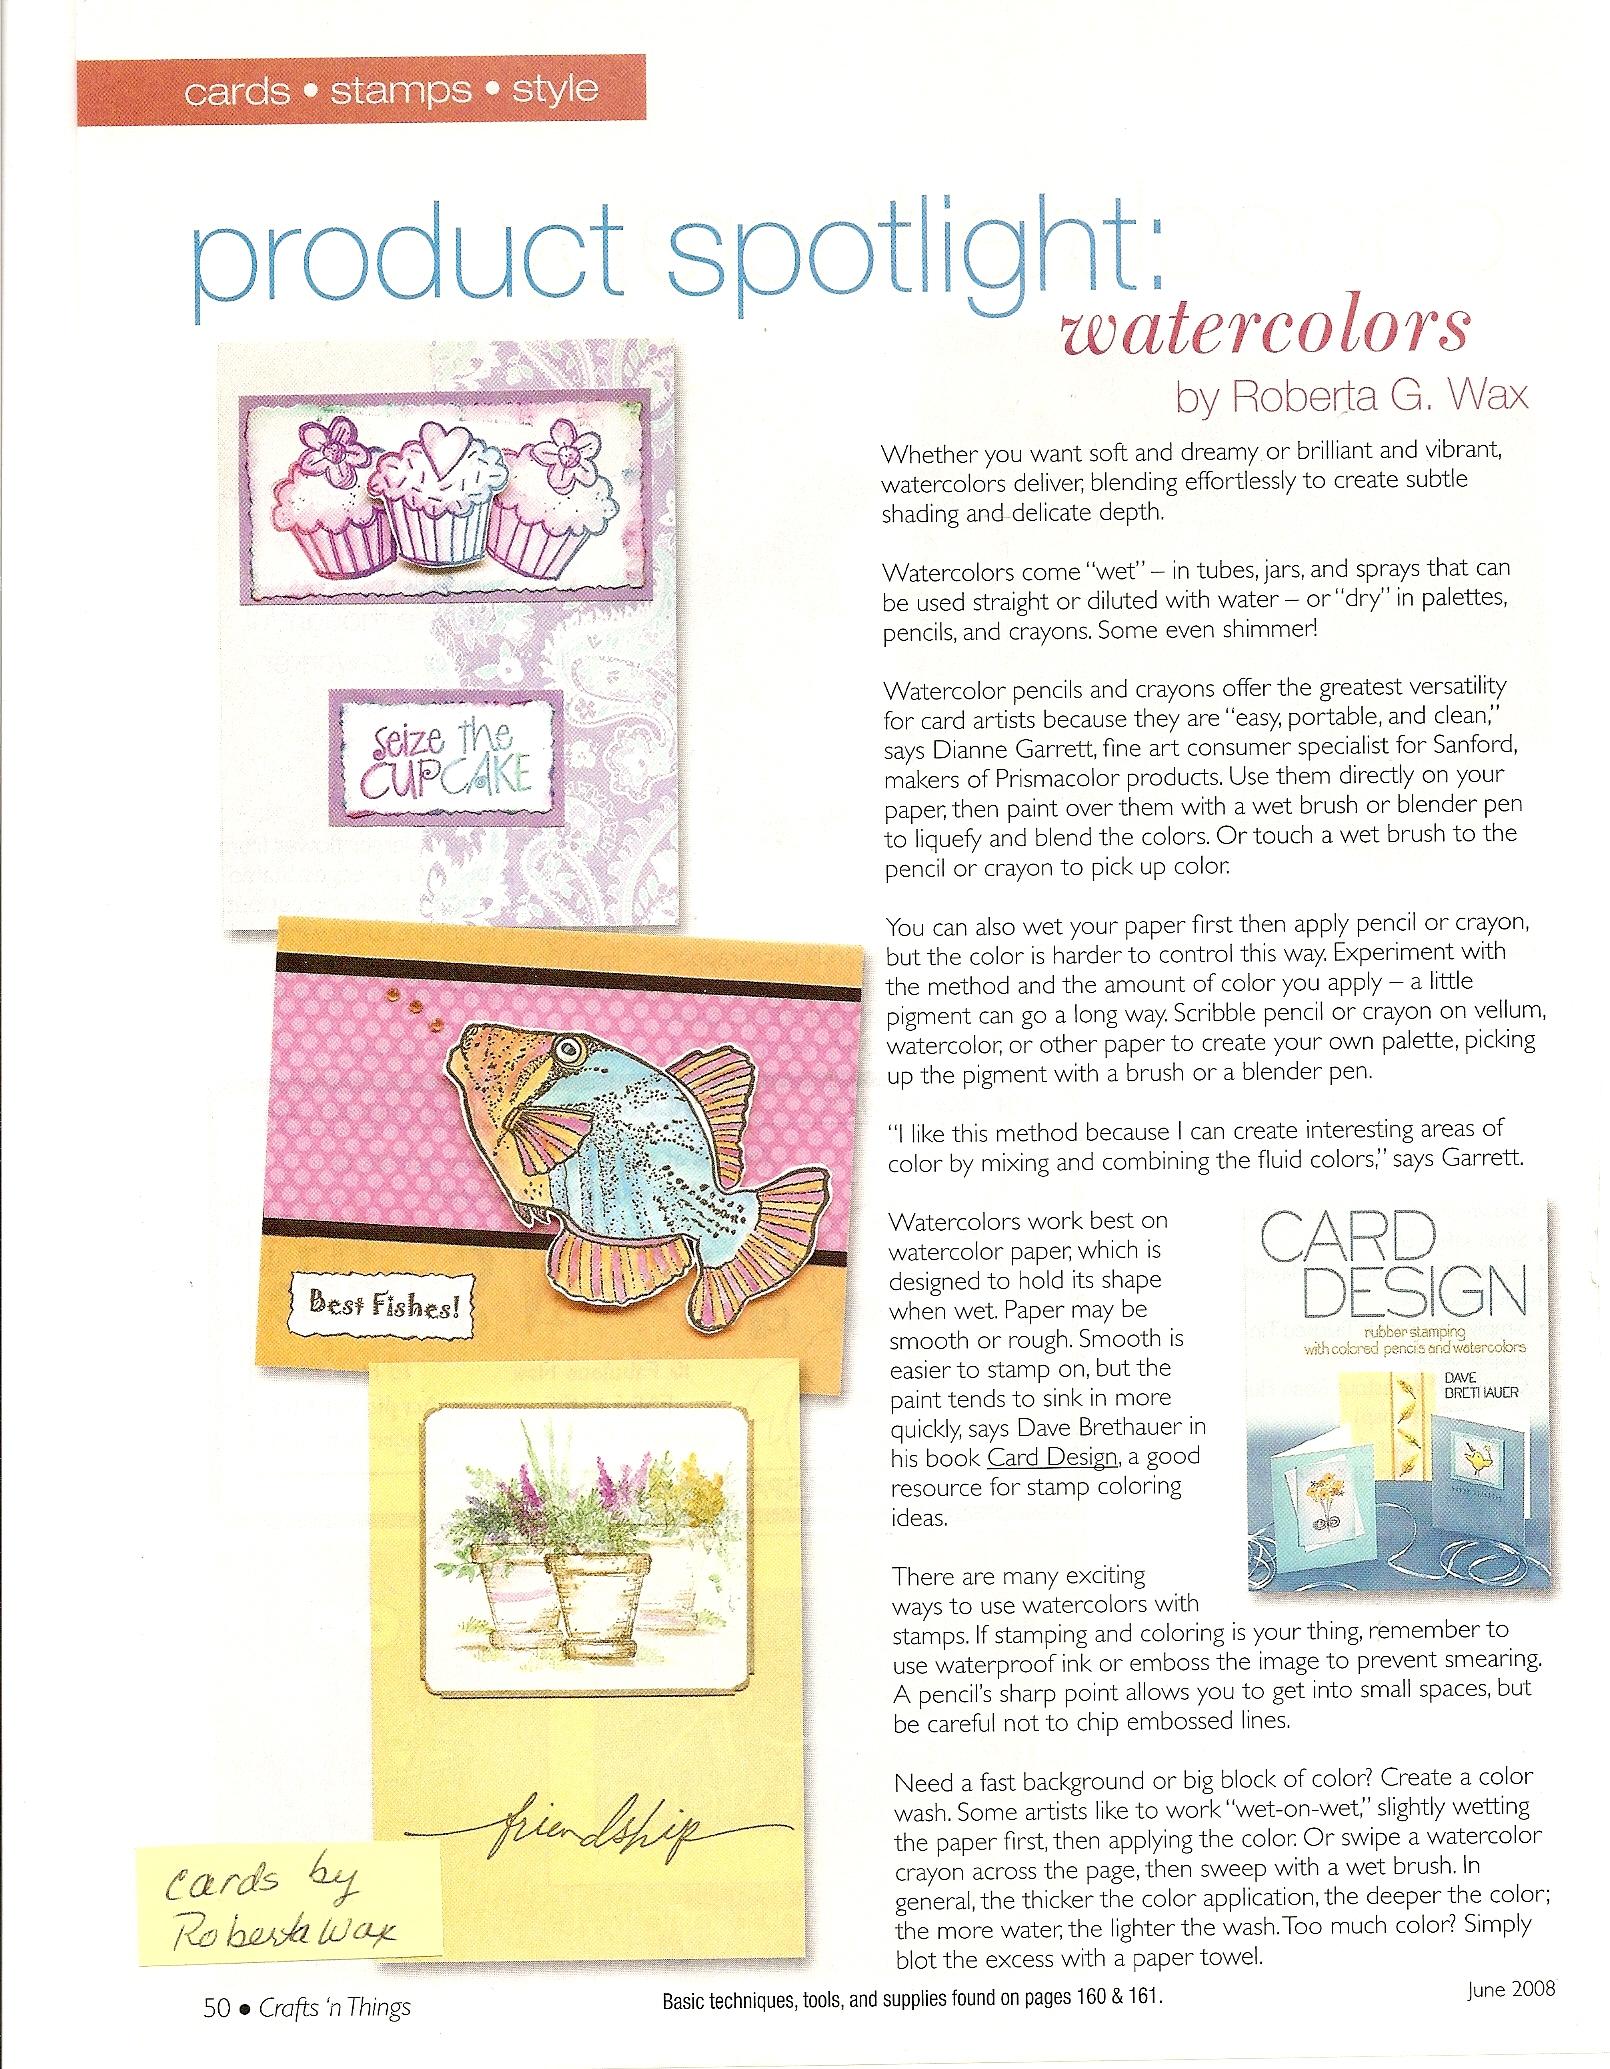 Crafts 'n Things Magazine